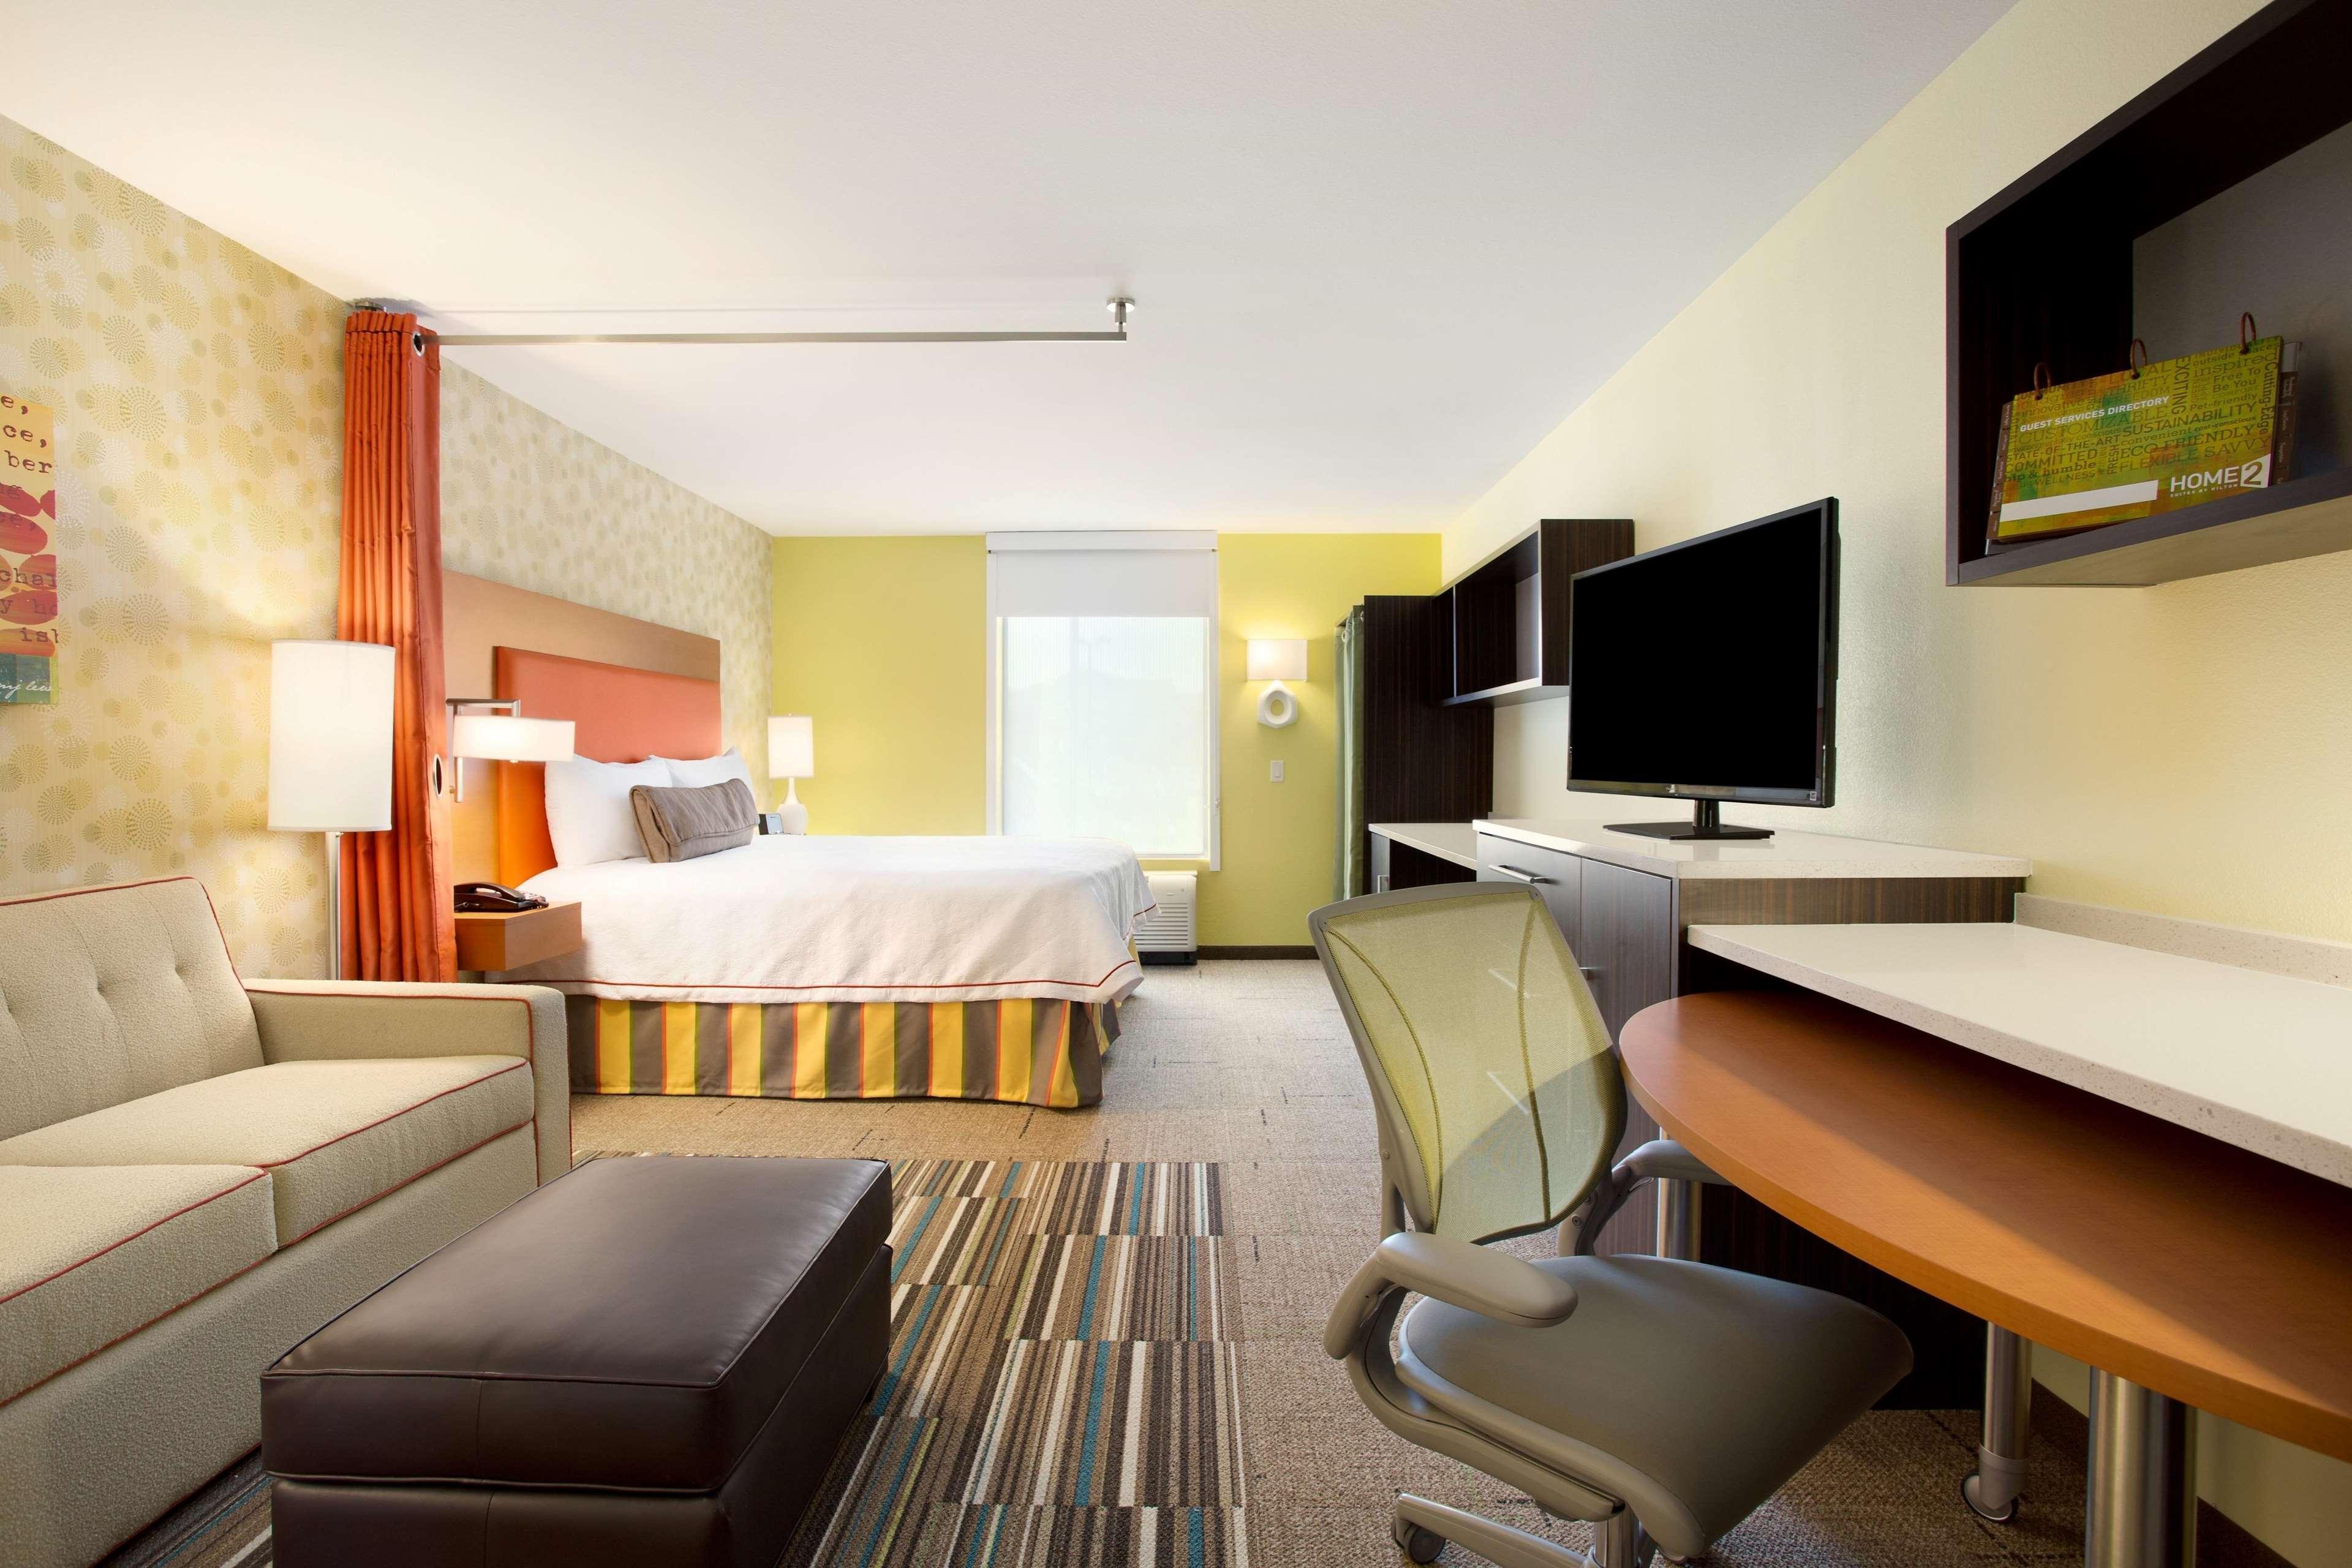 Home2 Suites by Hilton San Antonio Airport, TX image 20